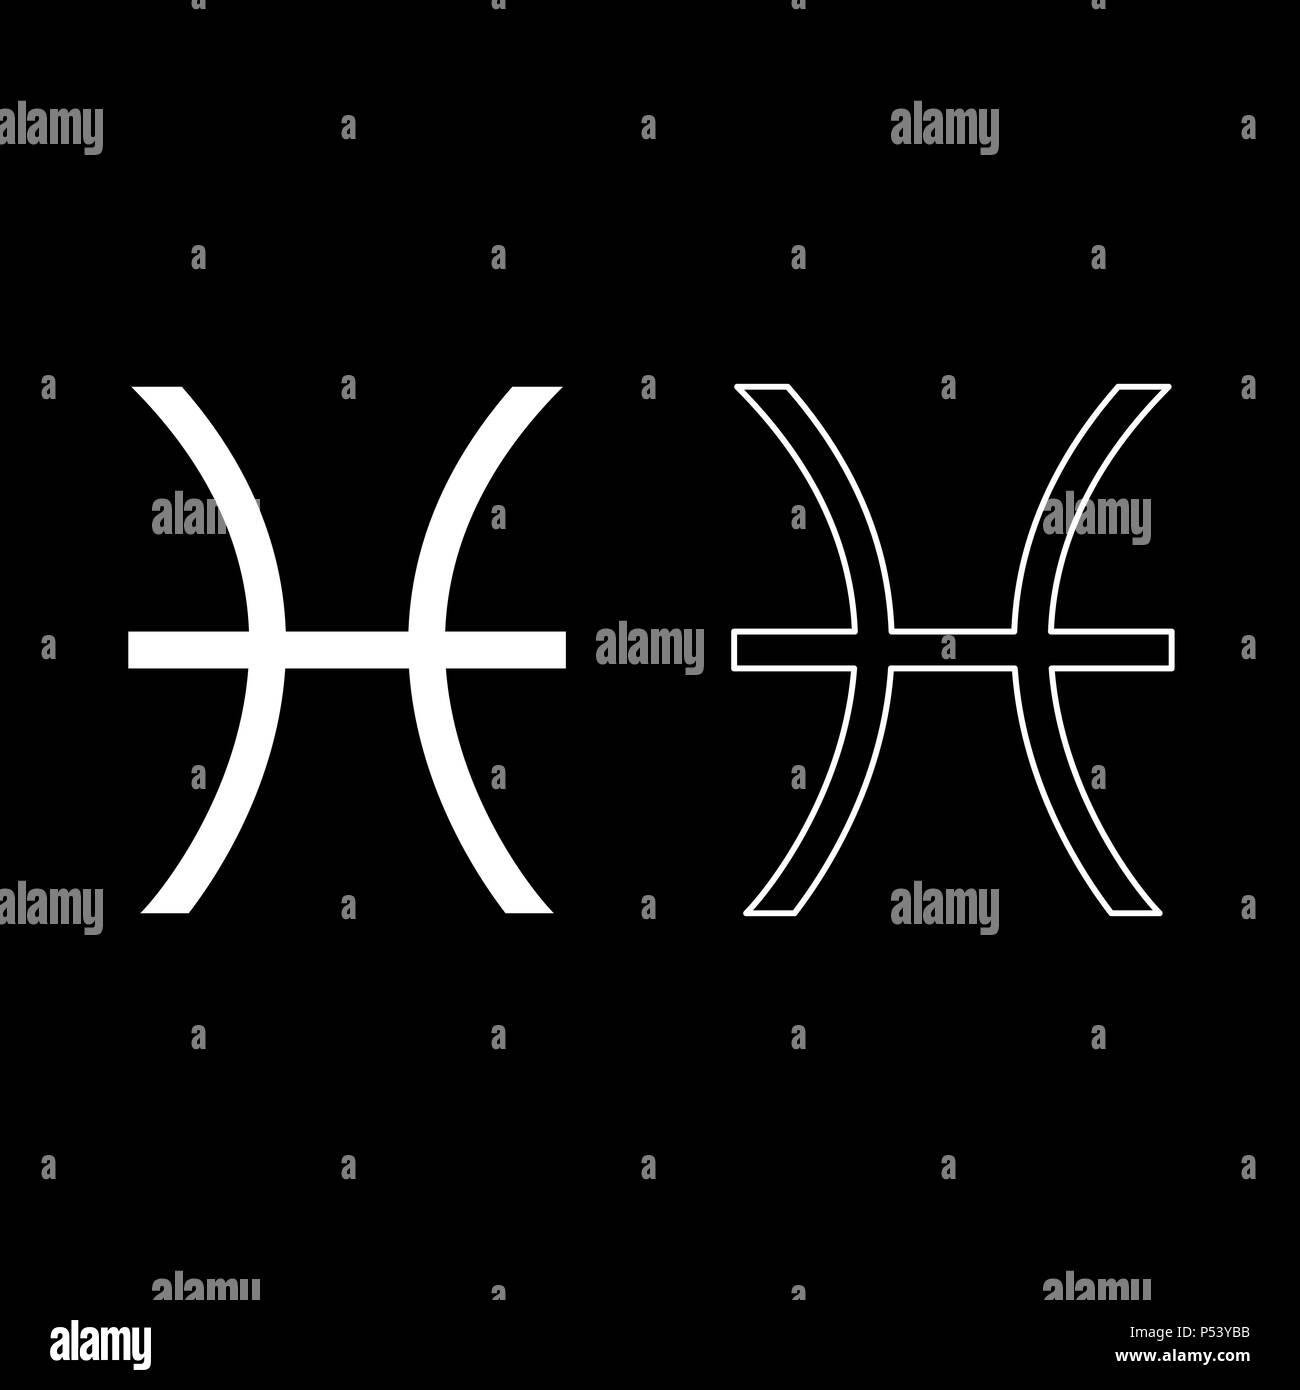 Pisces symbol zodiac icon set white color vector I flat style simple image - Stock Image